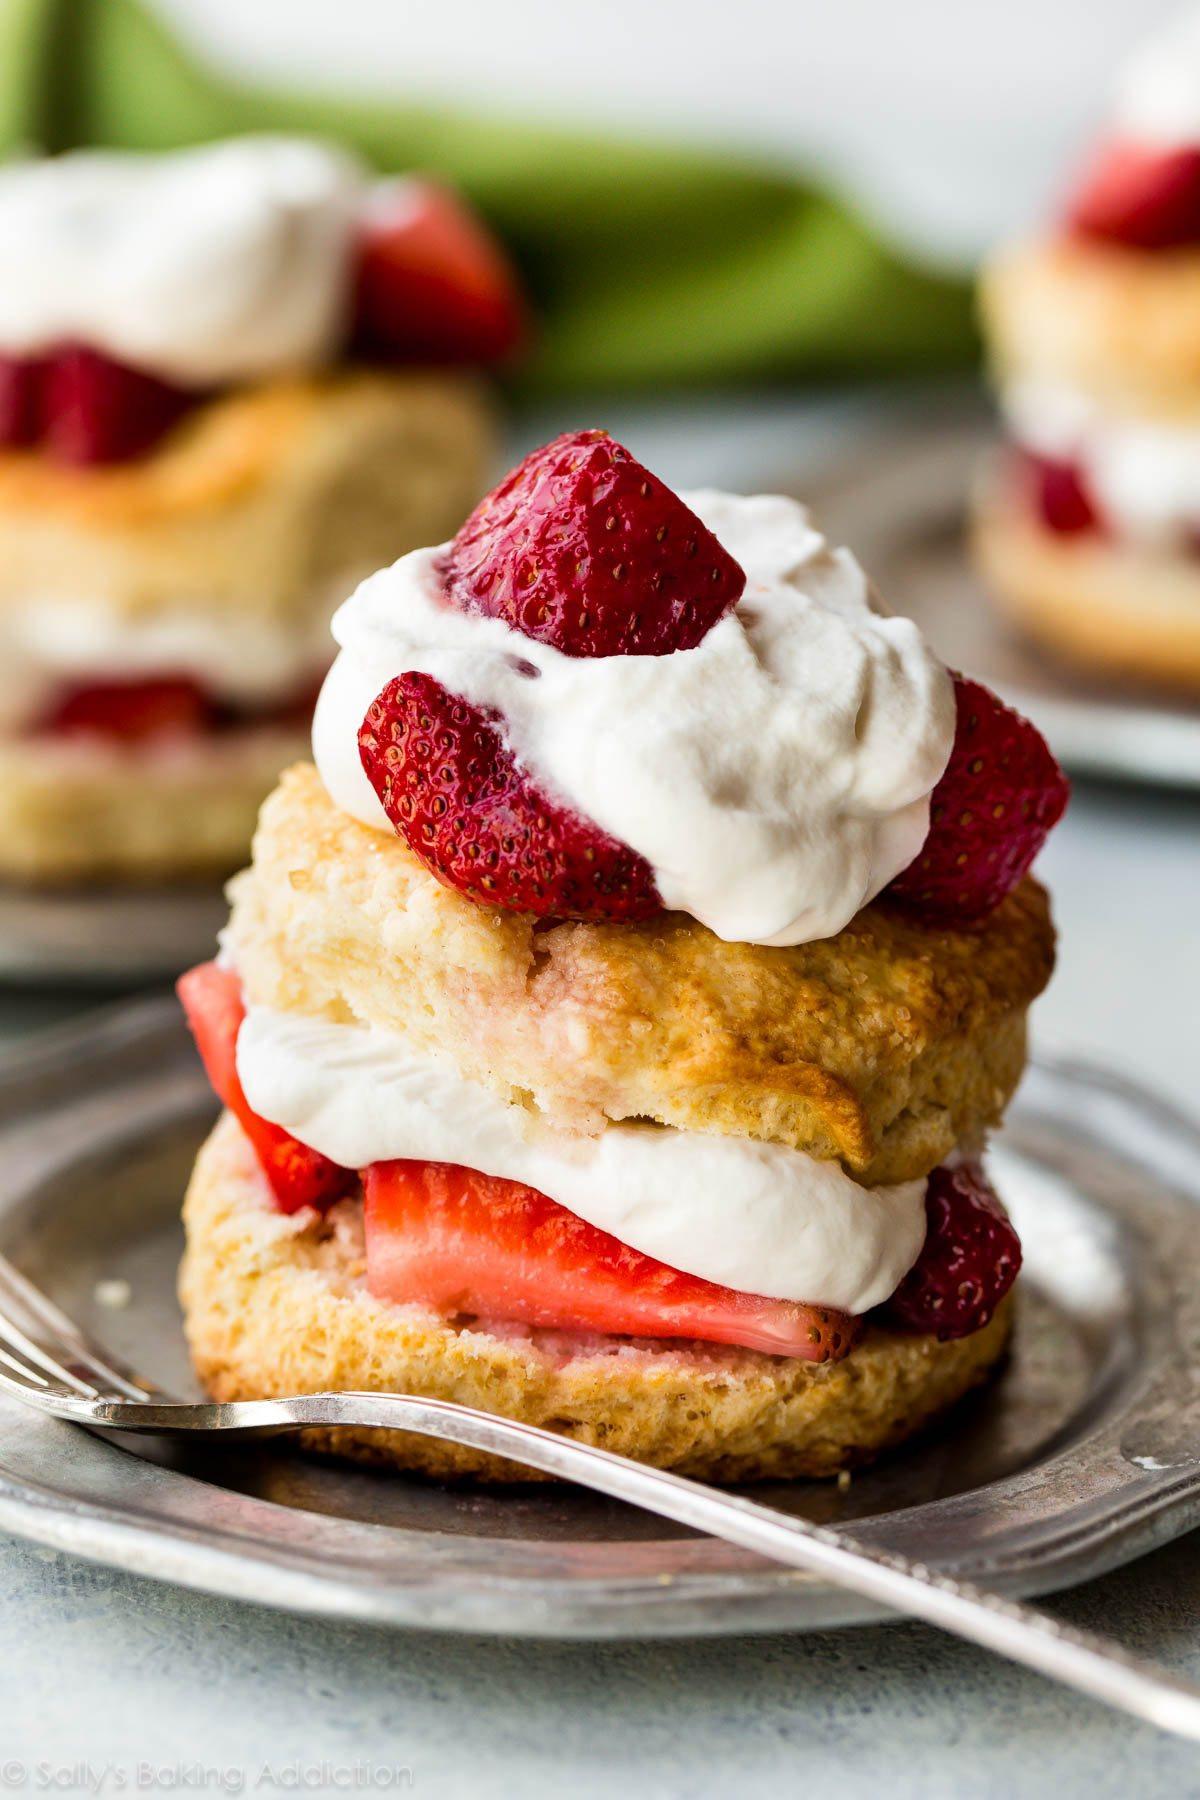 Recipe For Strawberry Shortcake  Easy Homemade Strawberry Shortcake Sallys Baking Addiction